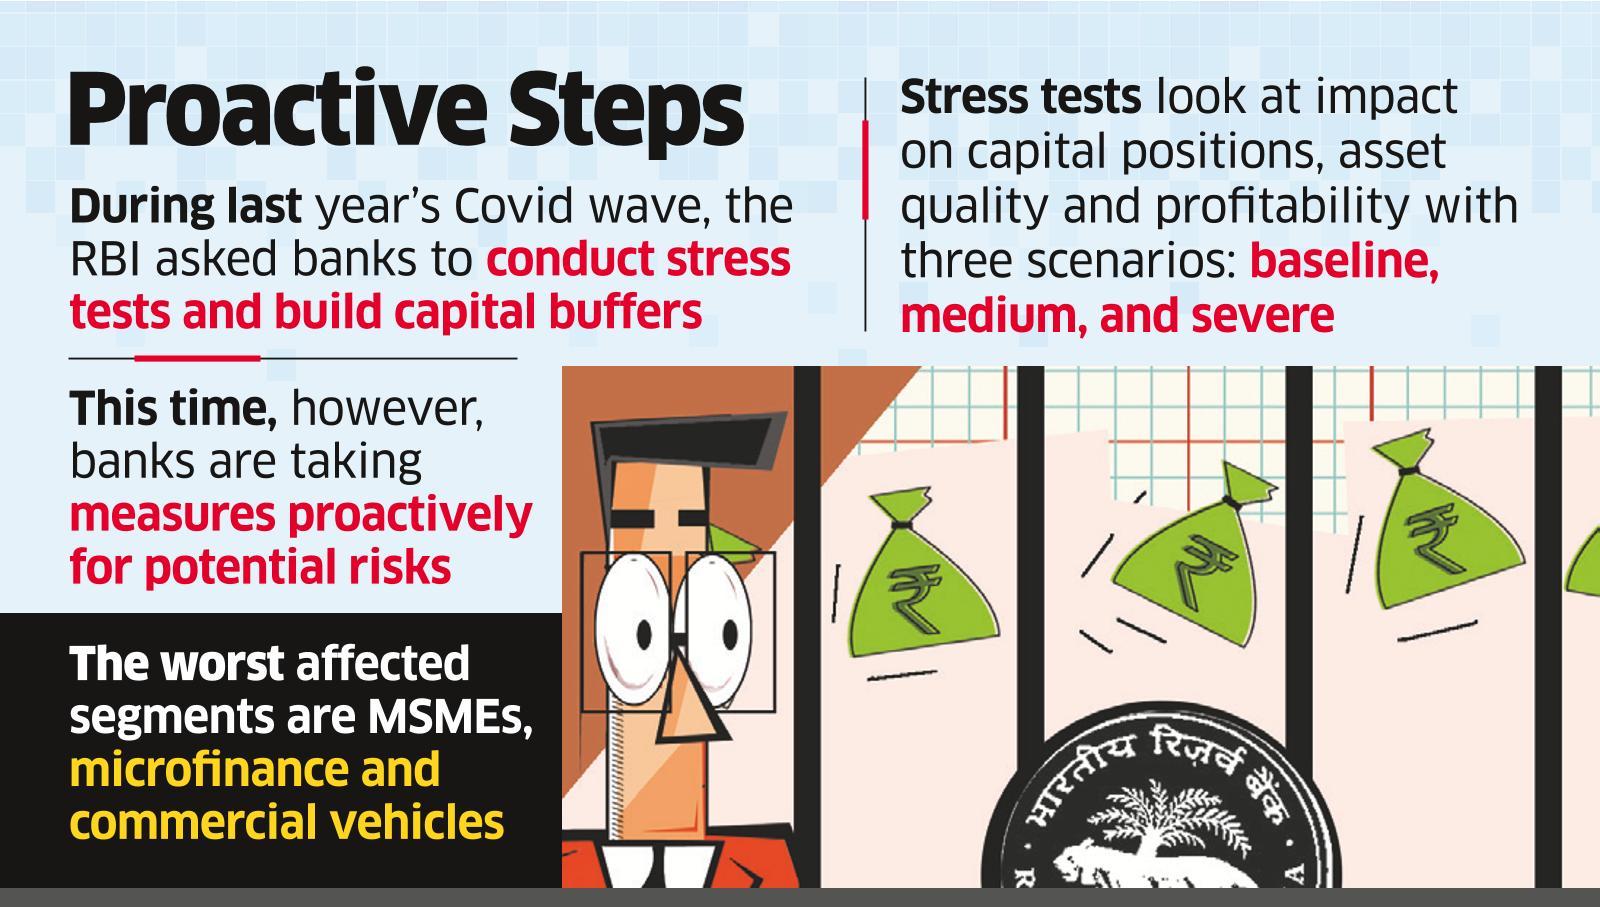 Banks Gauging Covid Risk Via Stress Tests